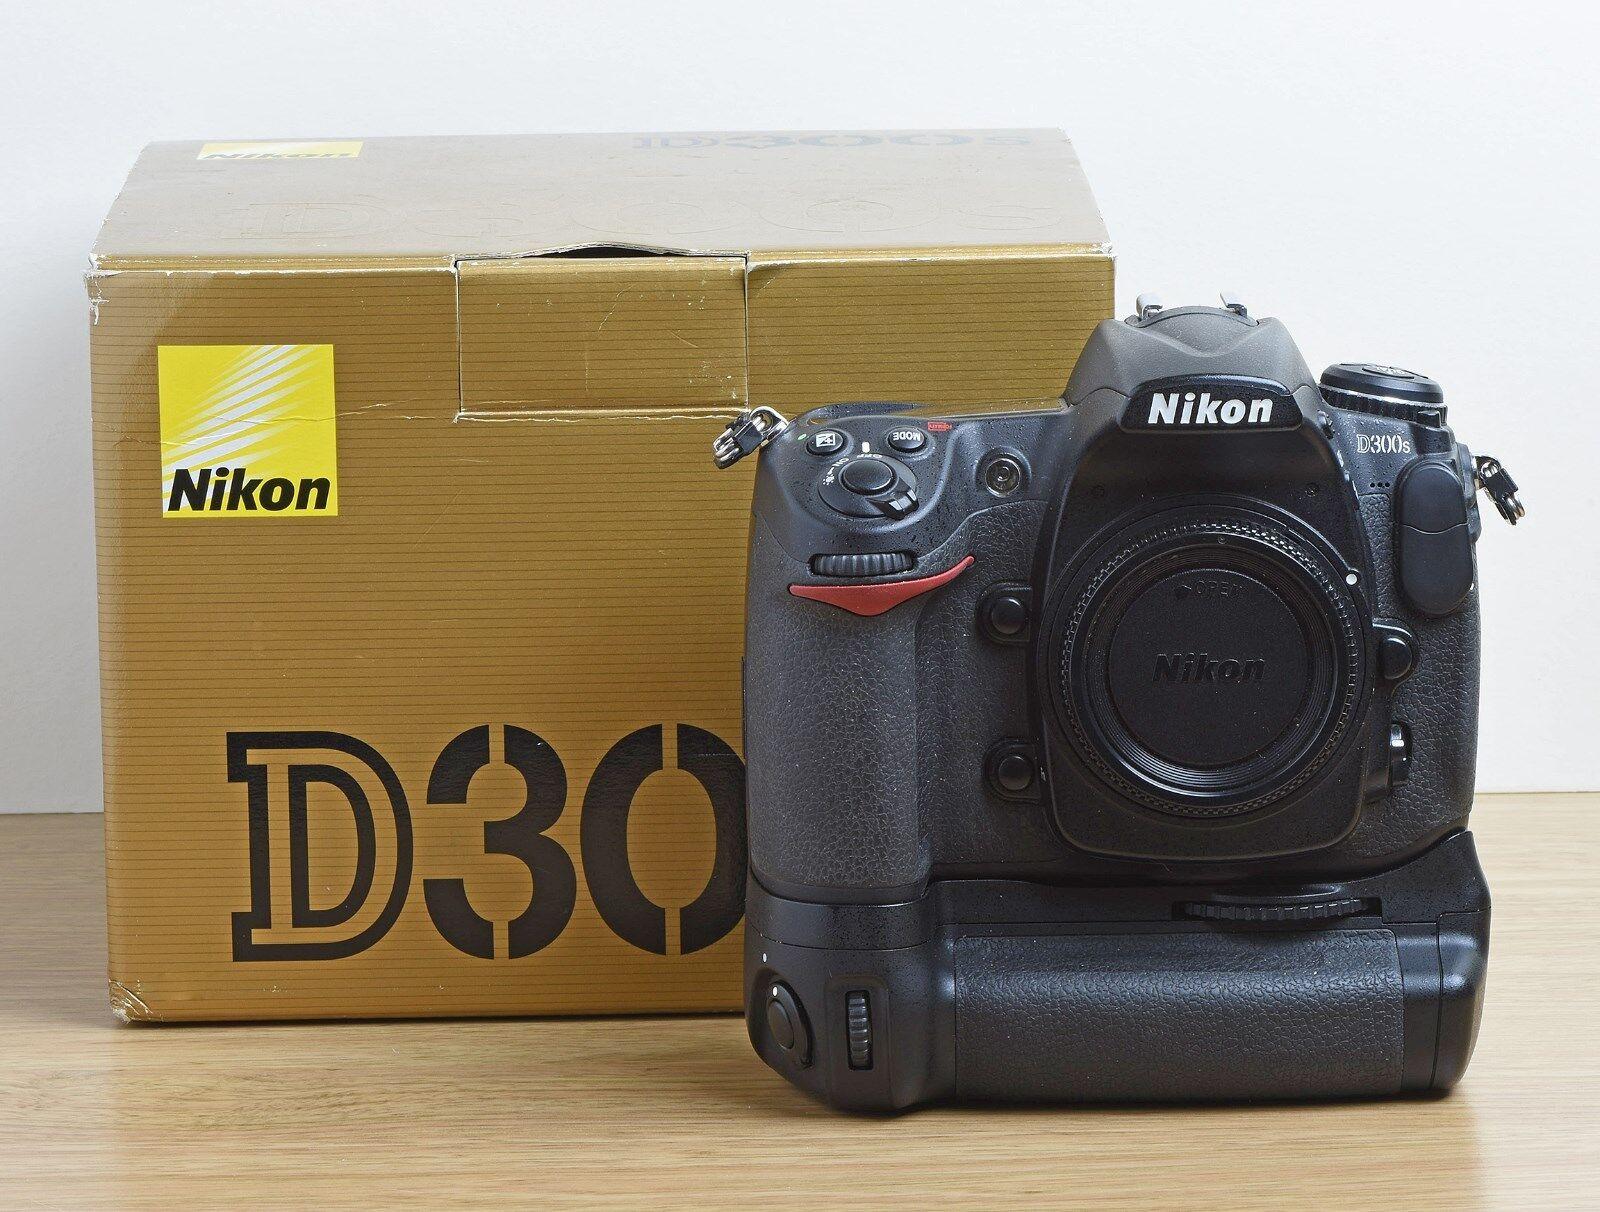 Nikon D D300S 12.3MP Digital SLR Camera - Black (Body only) | eBay